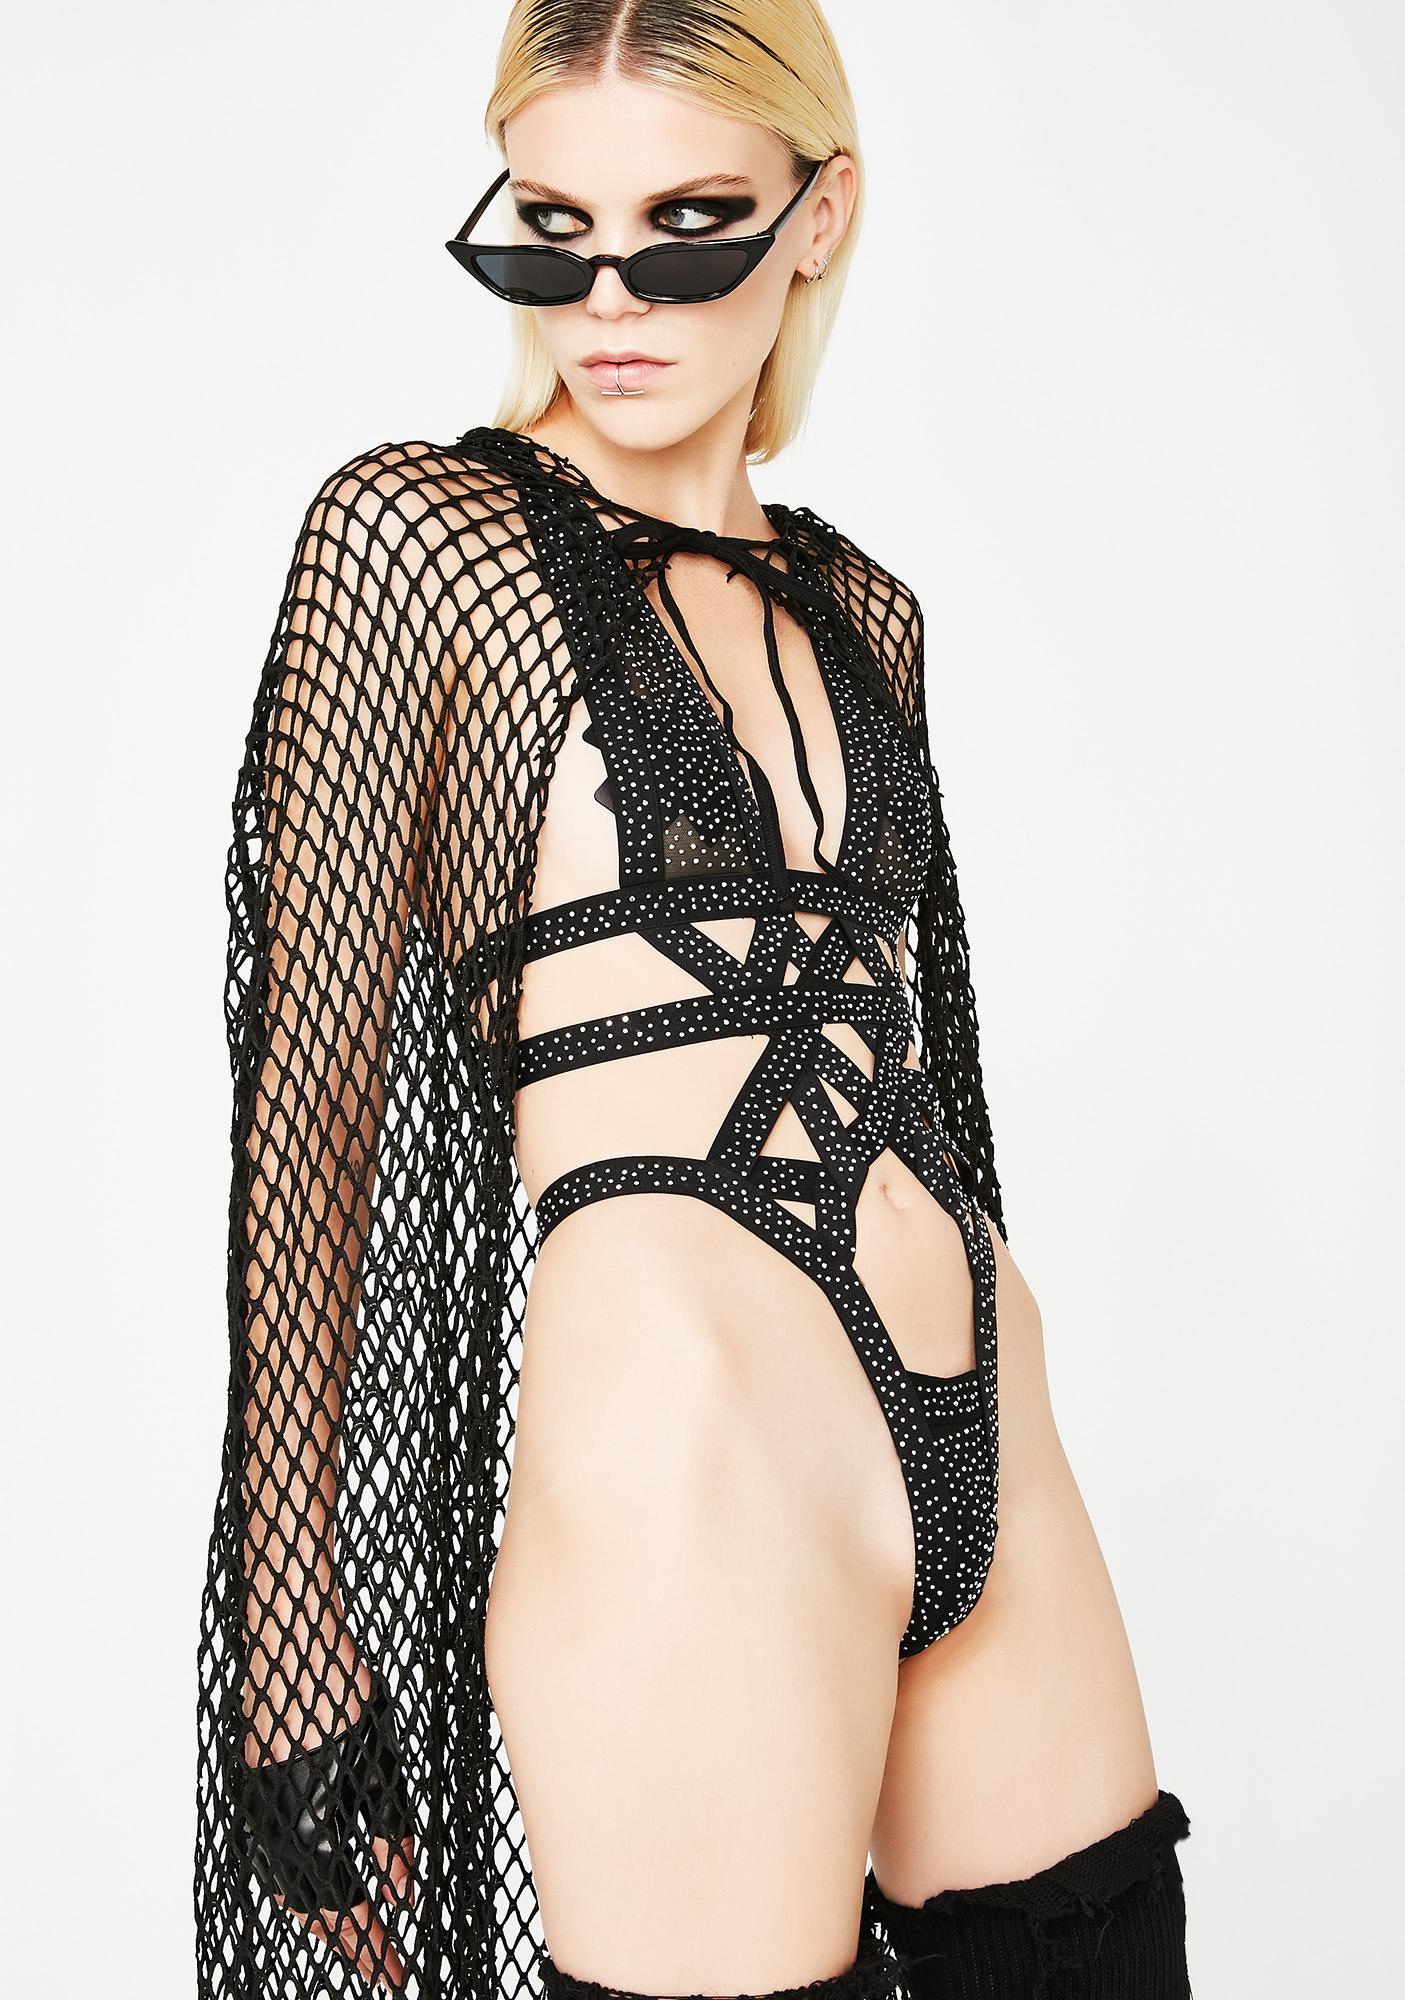 Kiki Riki Glam Warrior Strappy Bodysuit